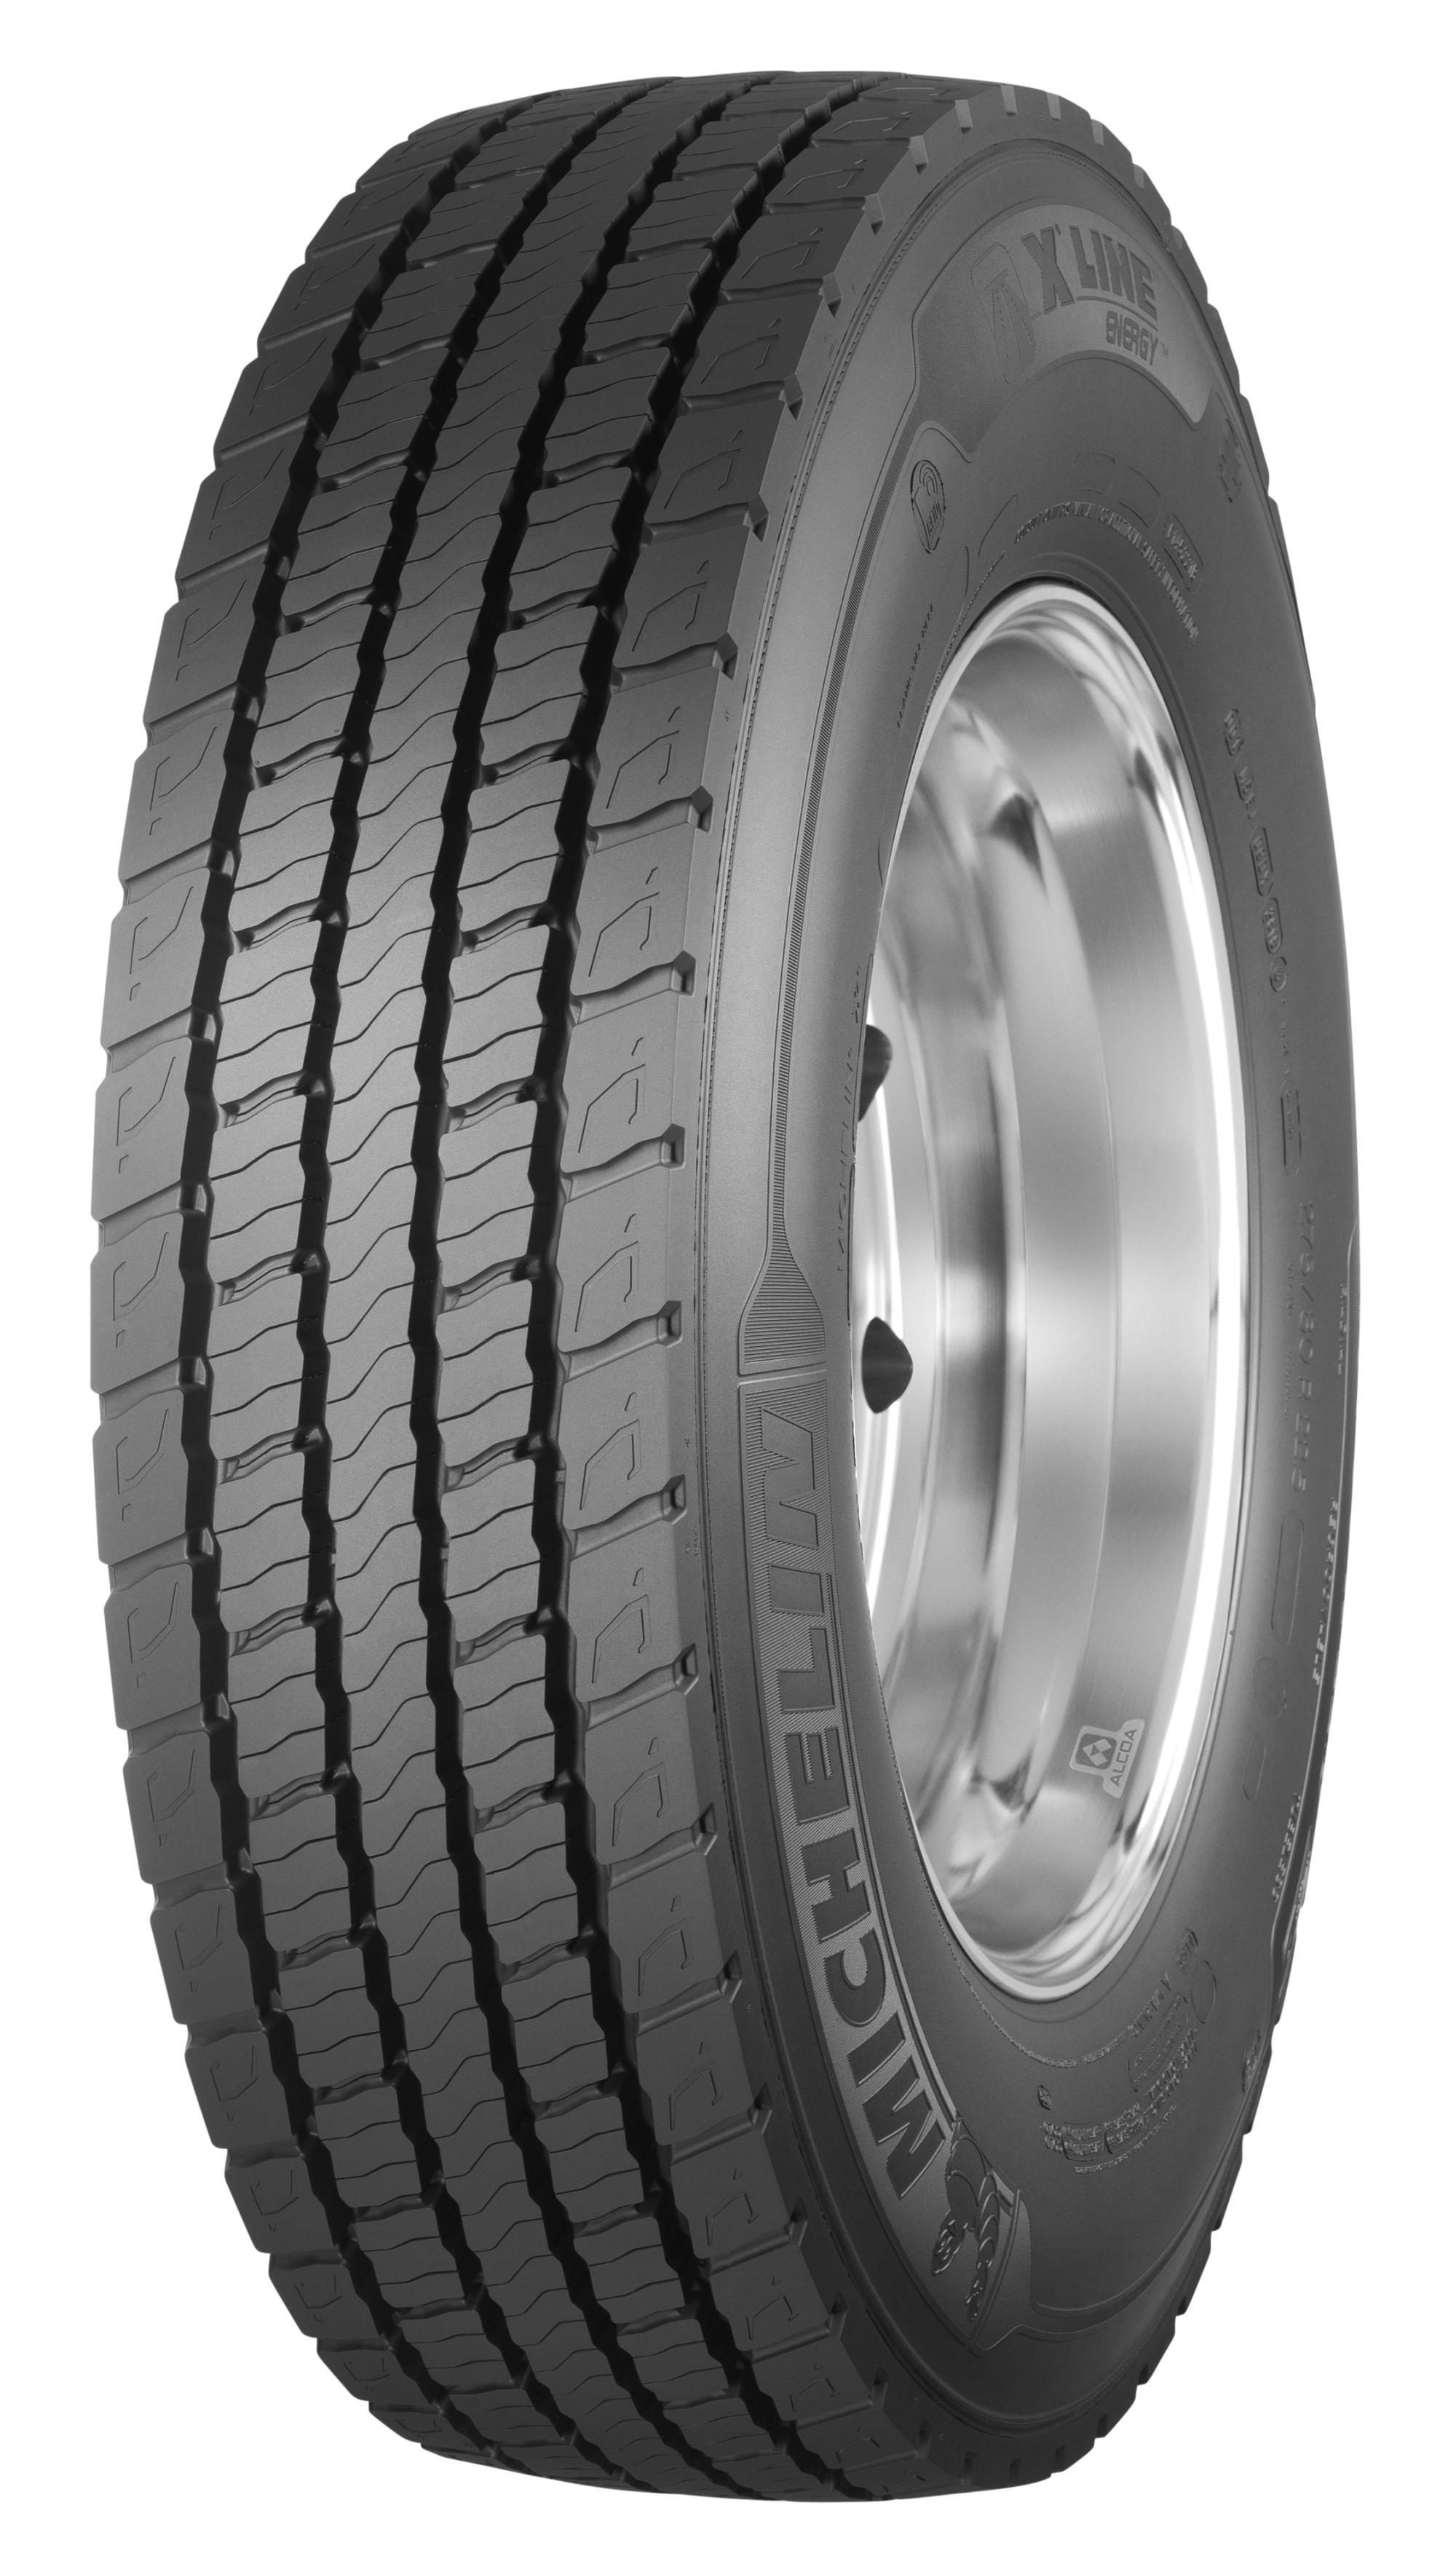 Michelin Unveils Its Most Fuel-Efficient Drive Tire